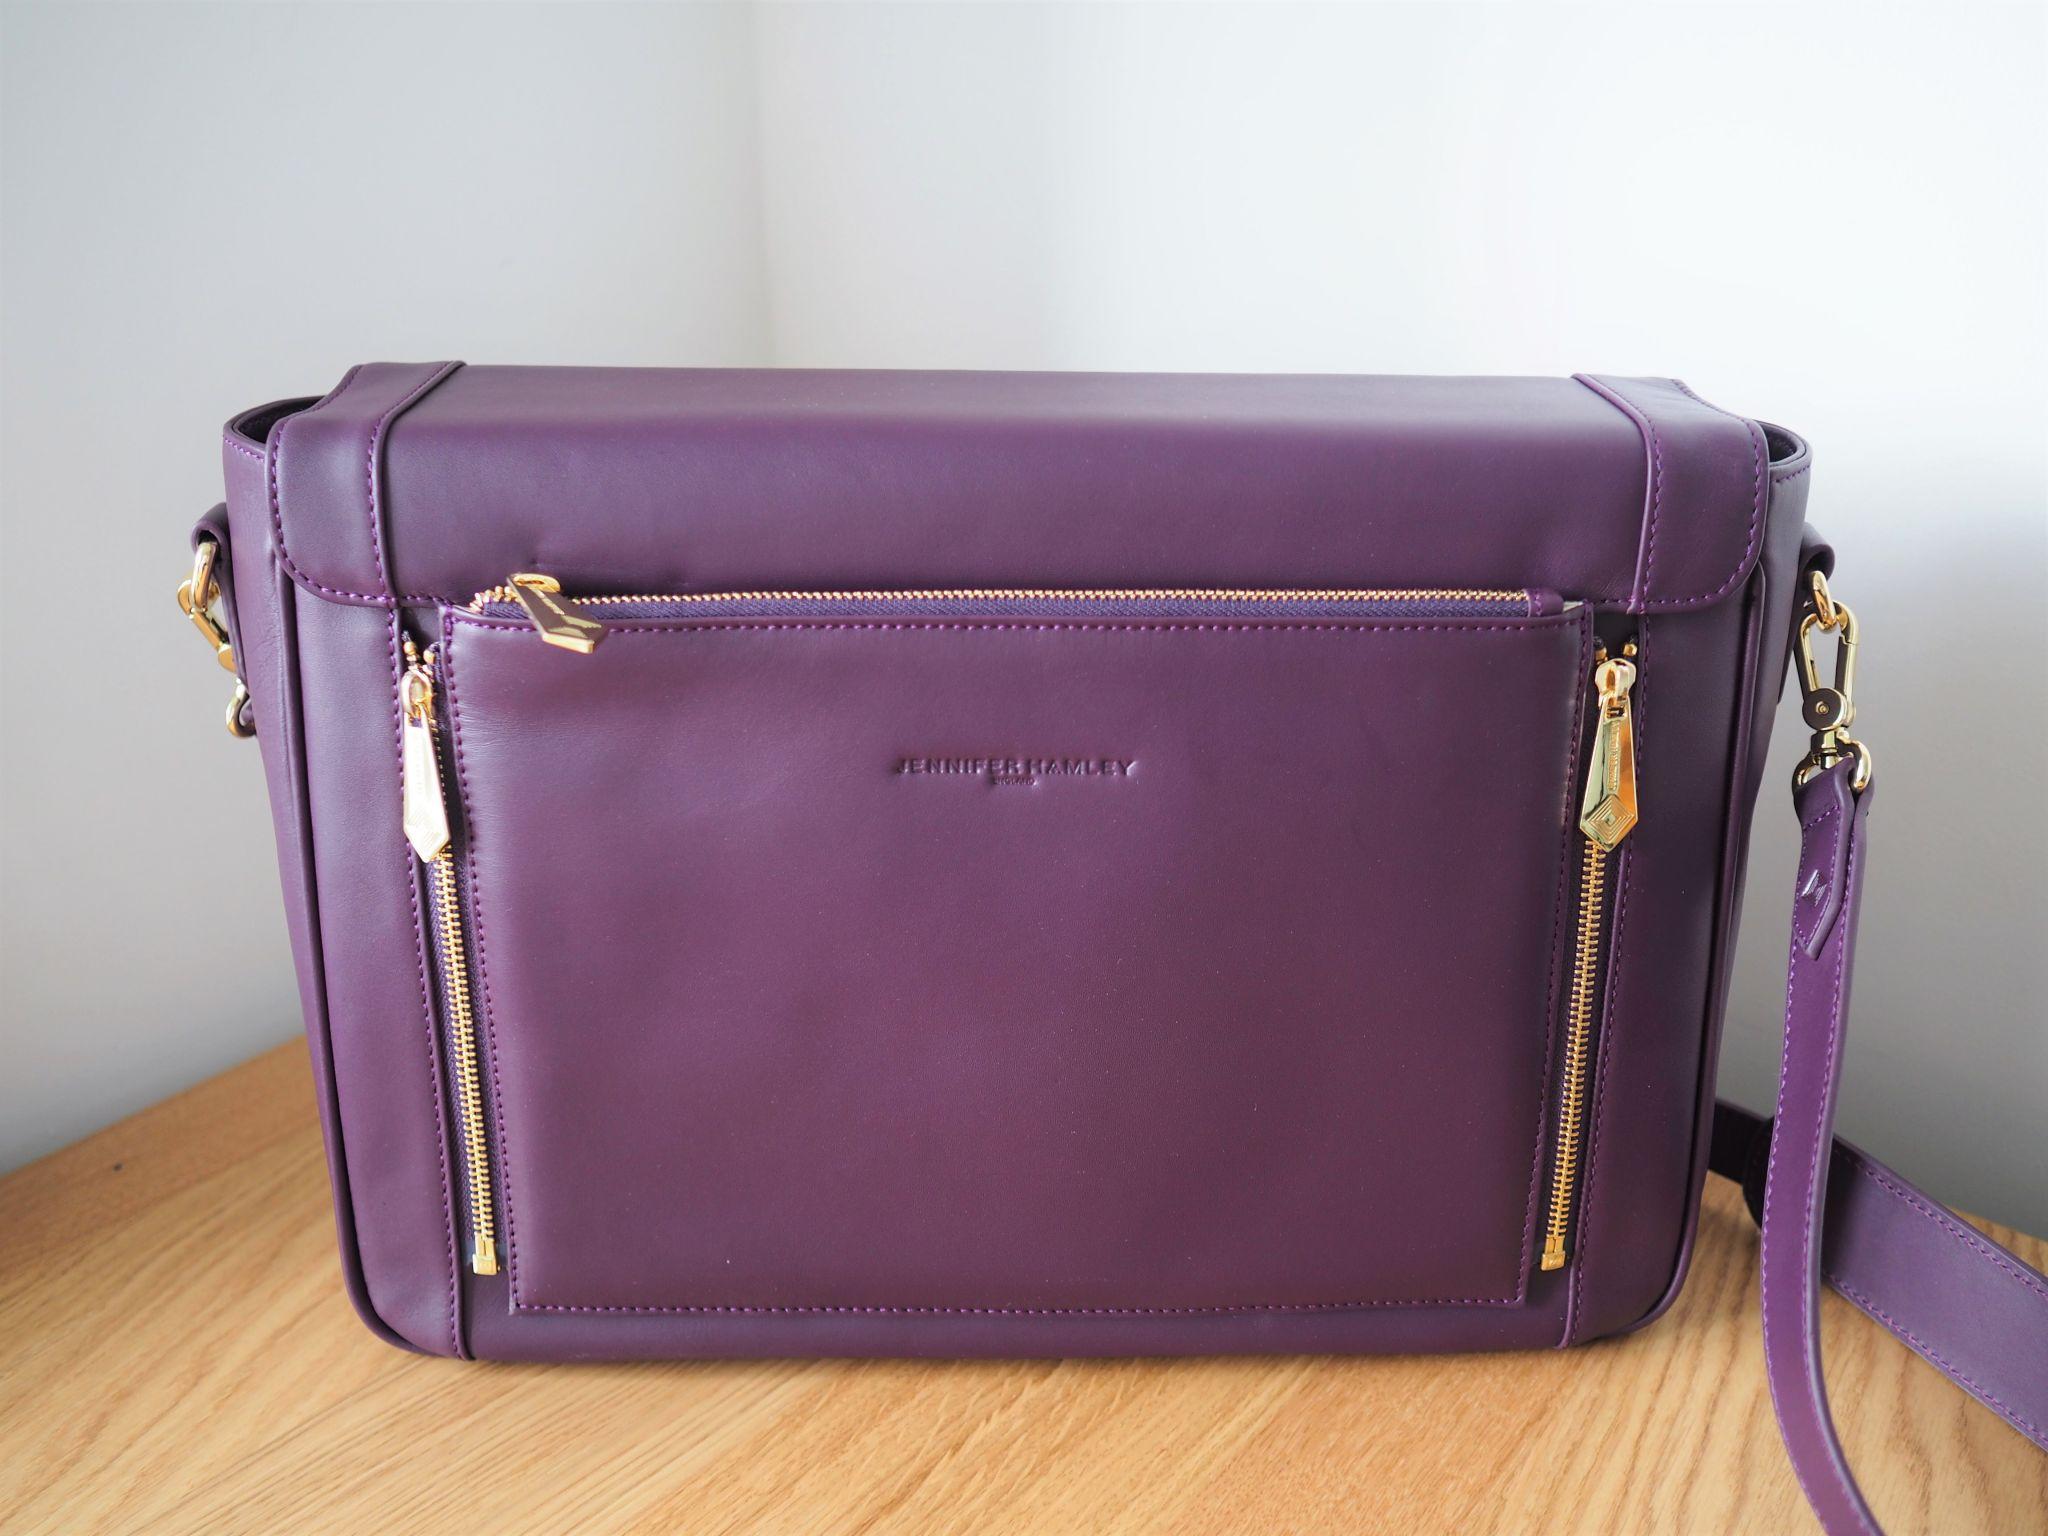 what-lizzy-loves-jennifer hamley-model-kt-laptop-work-bag-purple-leather